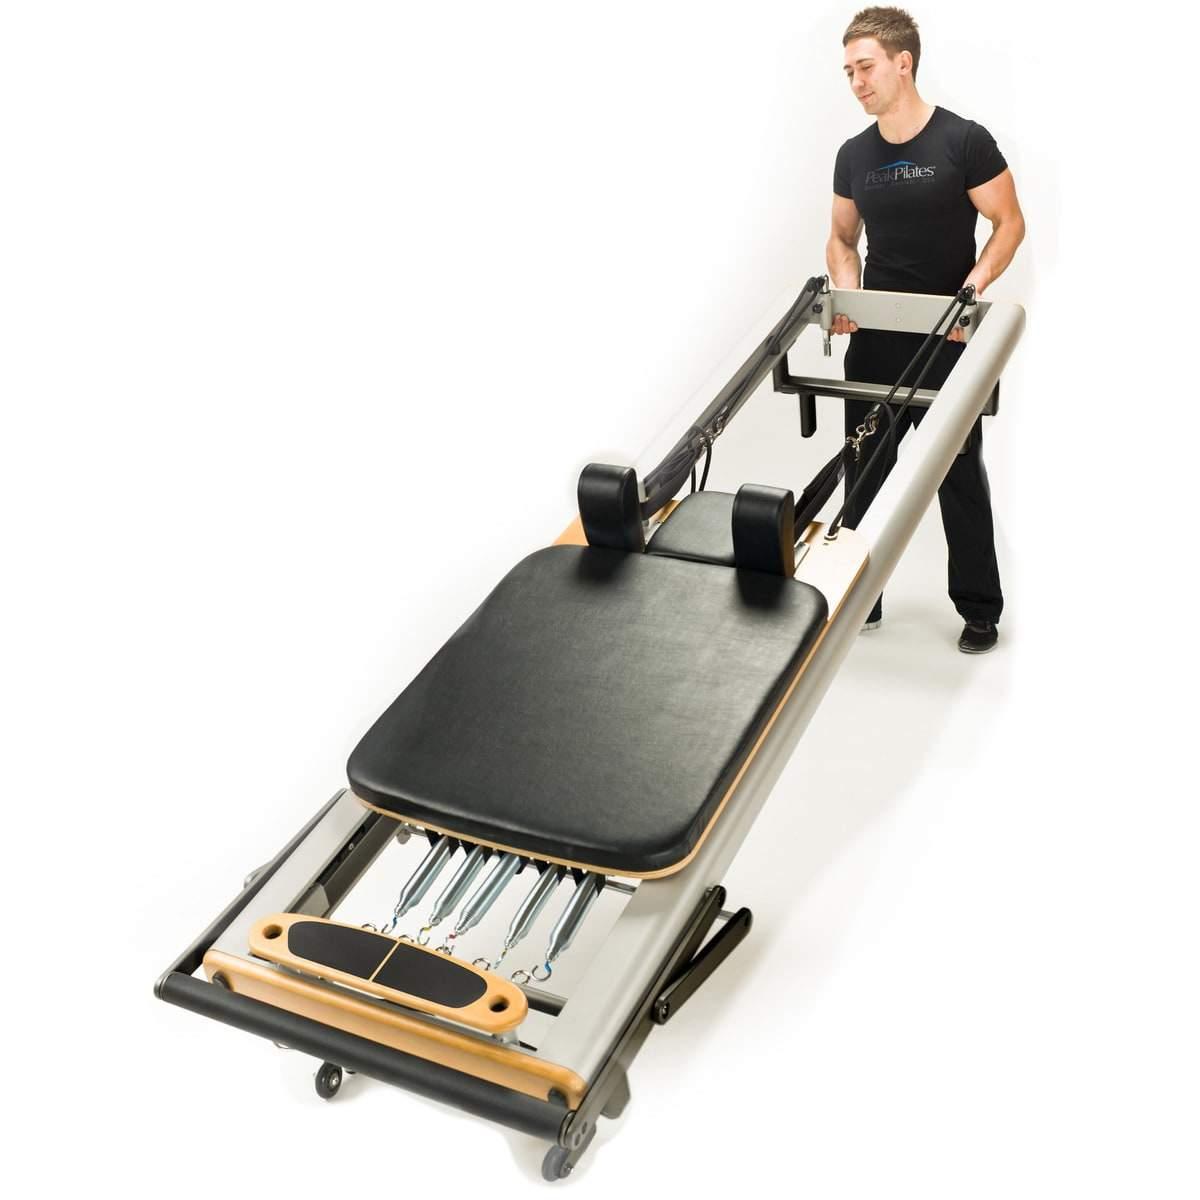 Peak Pilates fit™ Reformer inc Delivery